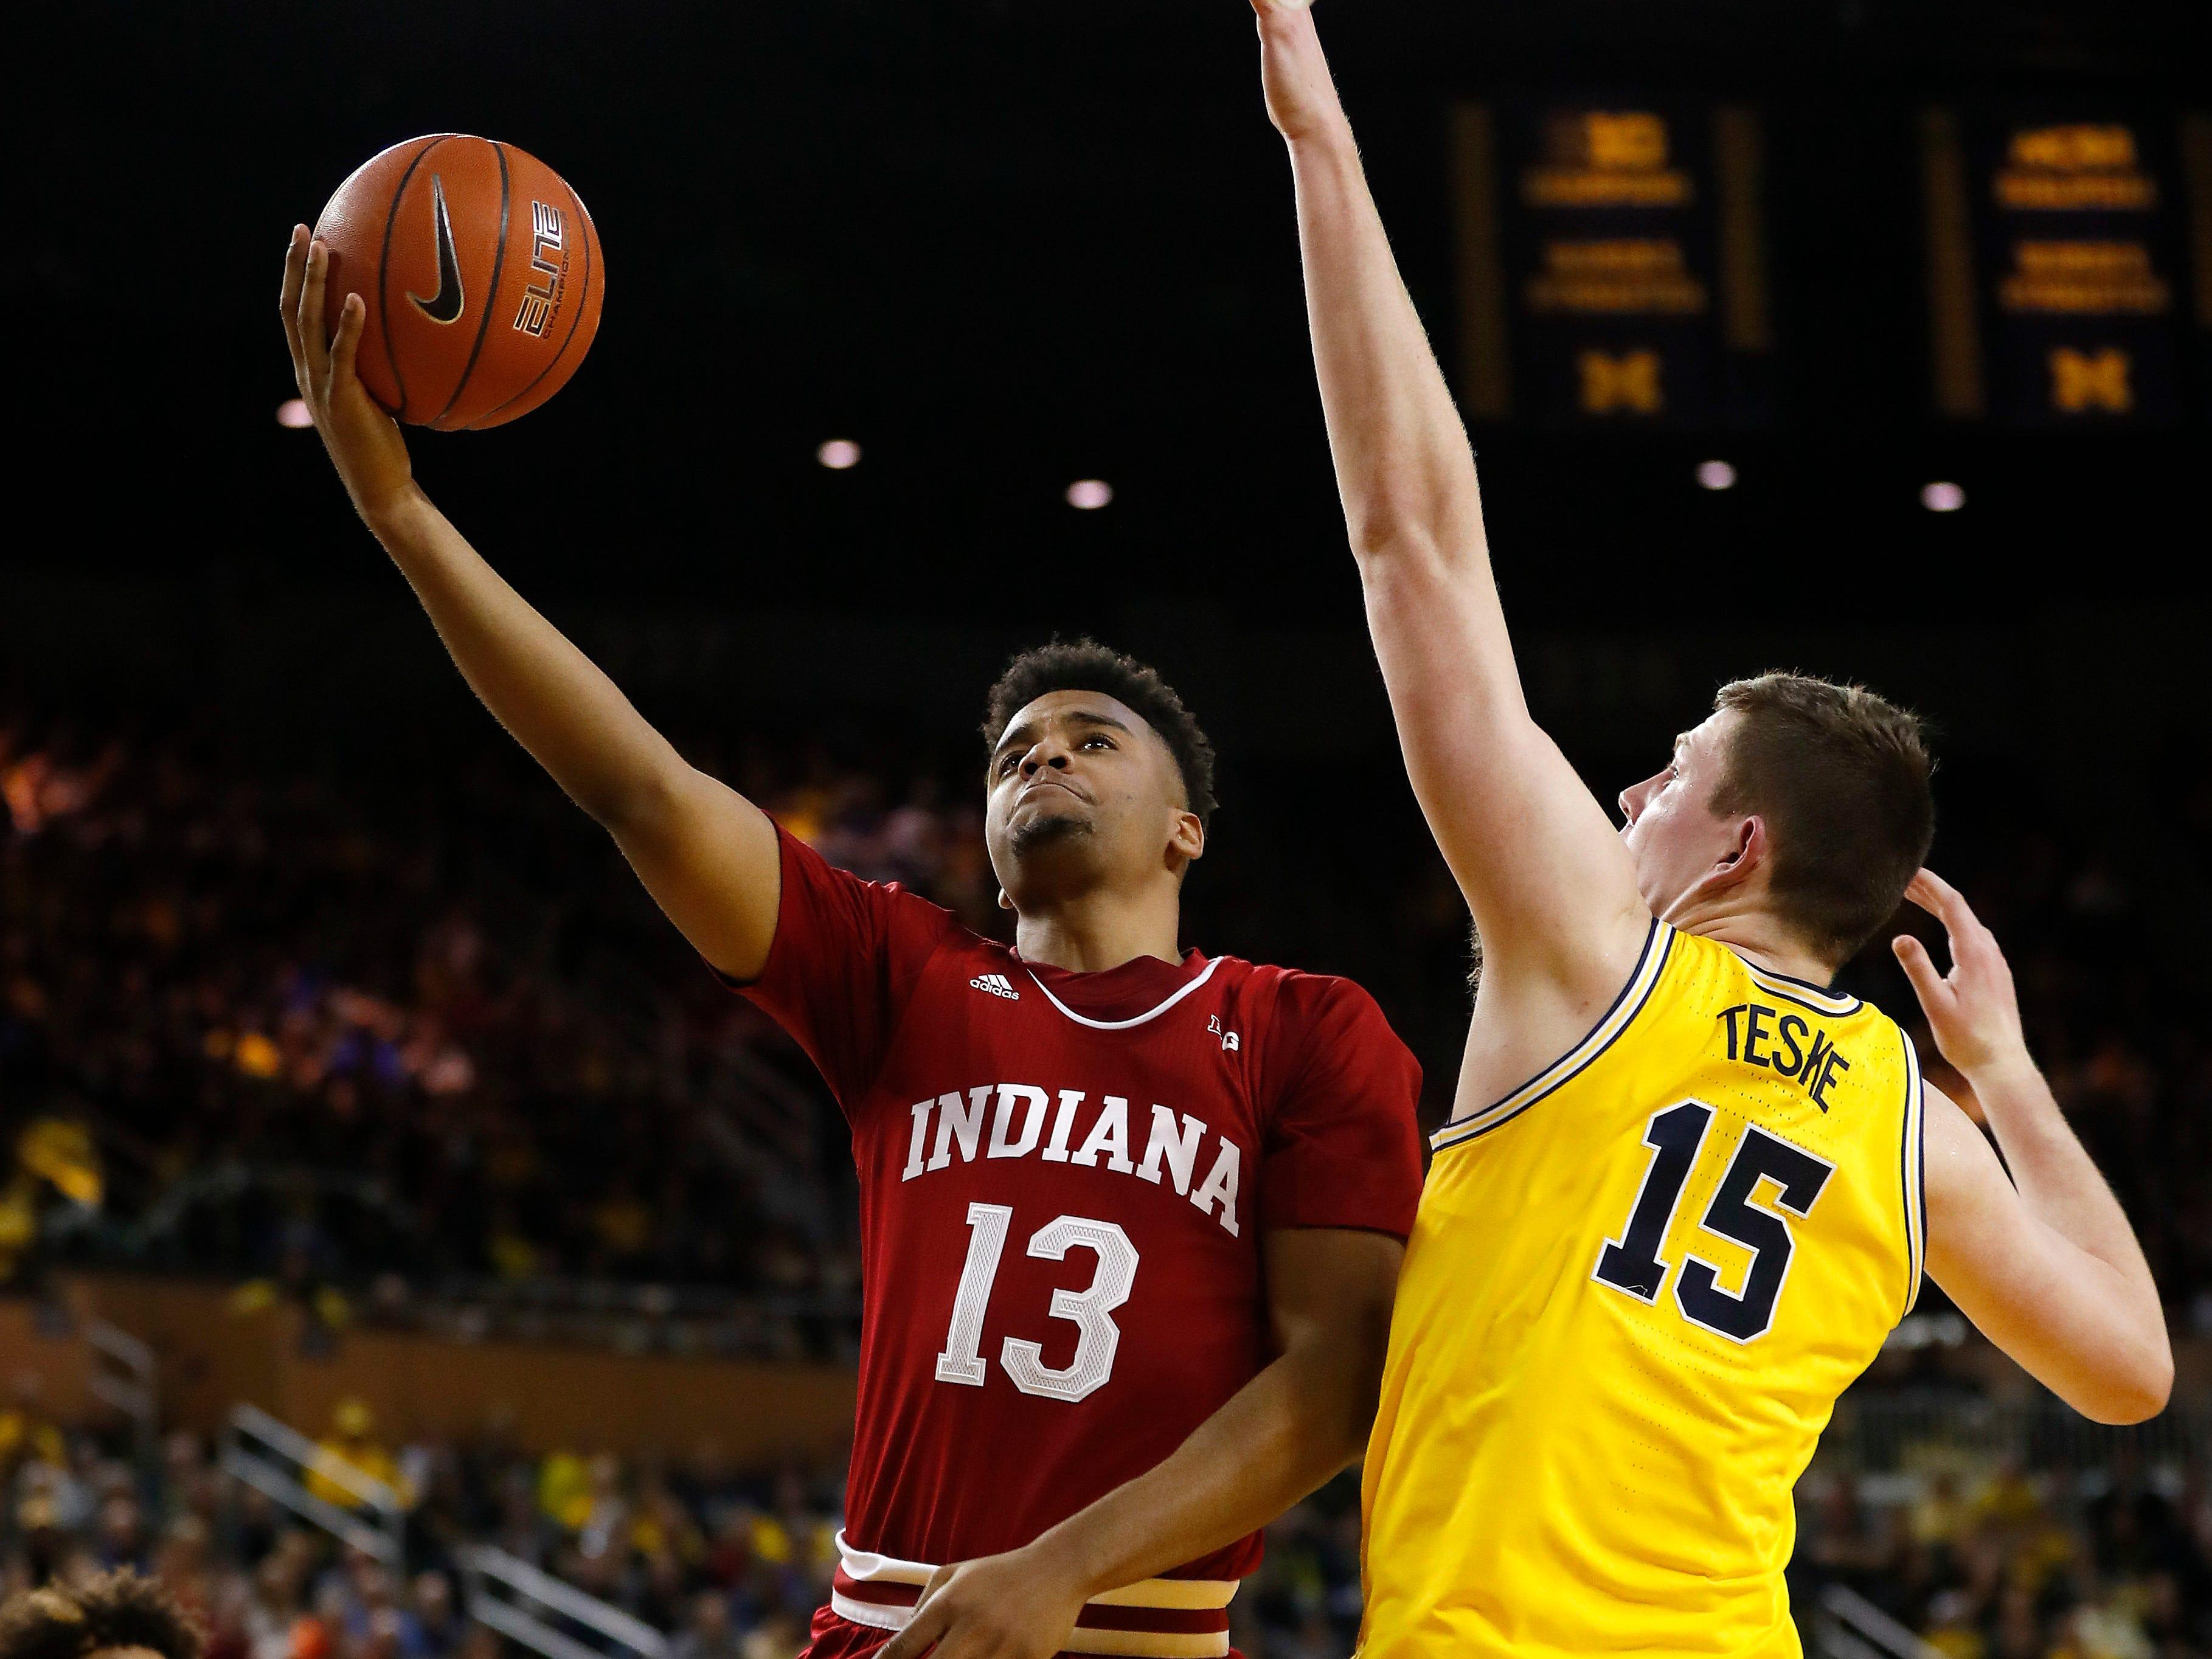 Indiana forward Juwan Morgan (13) shoots on Michigan center Jon Teske (15) in the first half of an NCAA college basketball game in Ann Arbor, Mich., Sunday, Jan. 6, 2019.